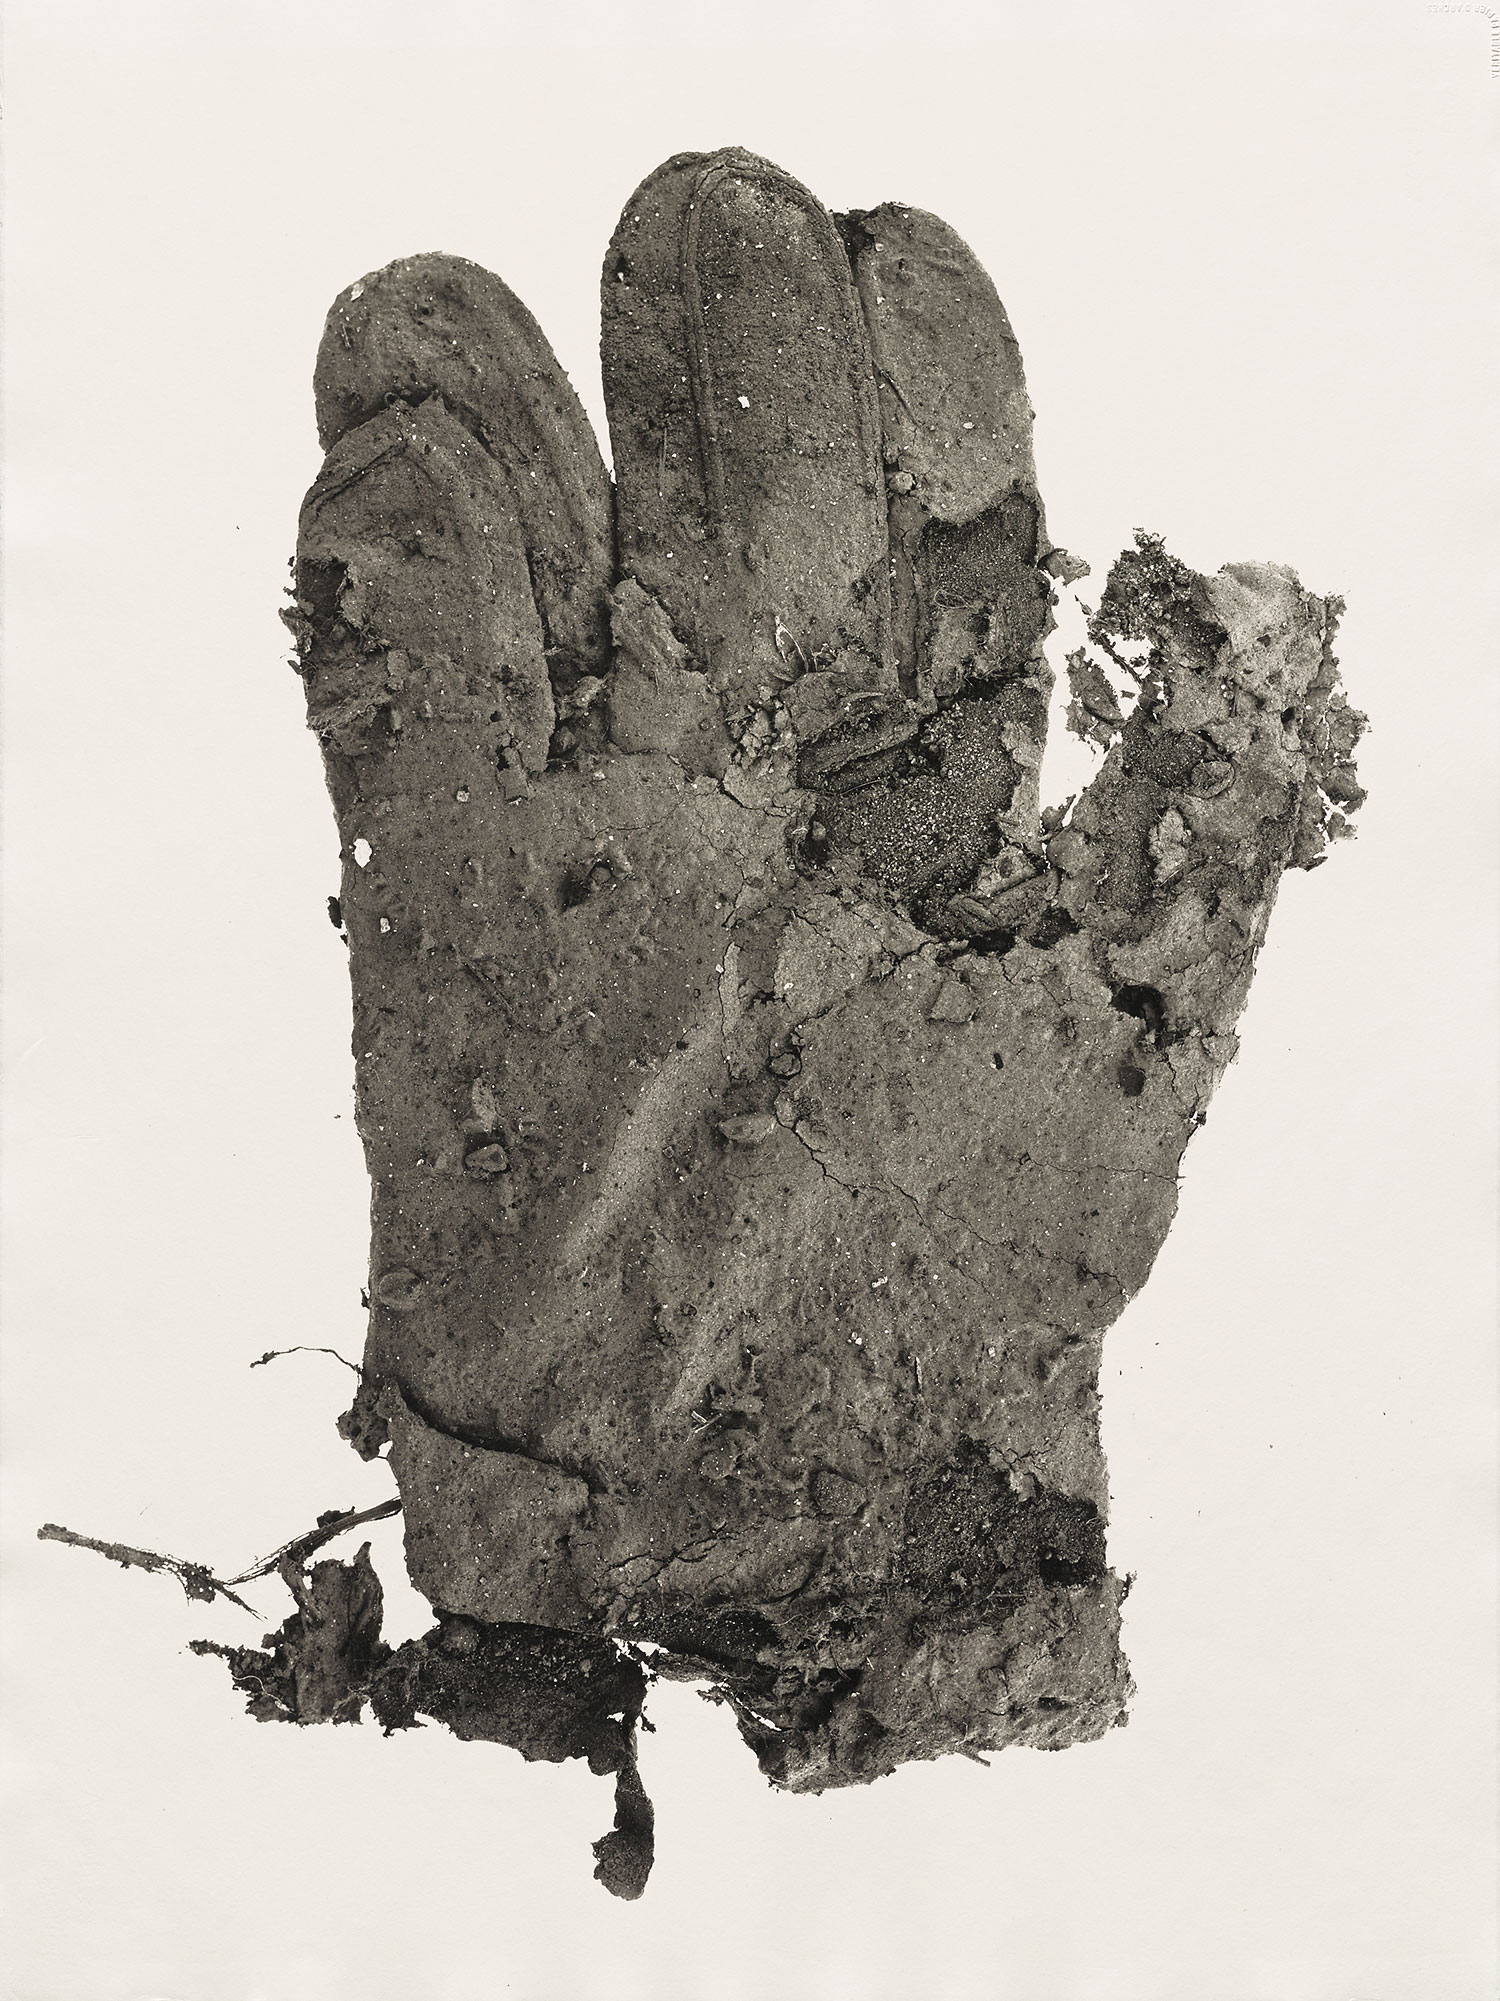 Irving Penn,  Mud Glove , New York, 1975. Platinum-palladium print.  ©  The Irving Penn Foundation